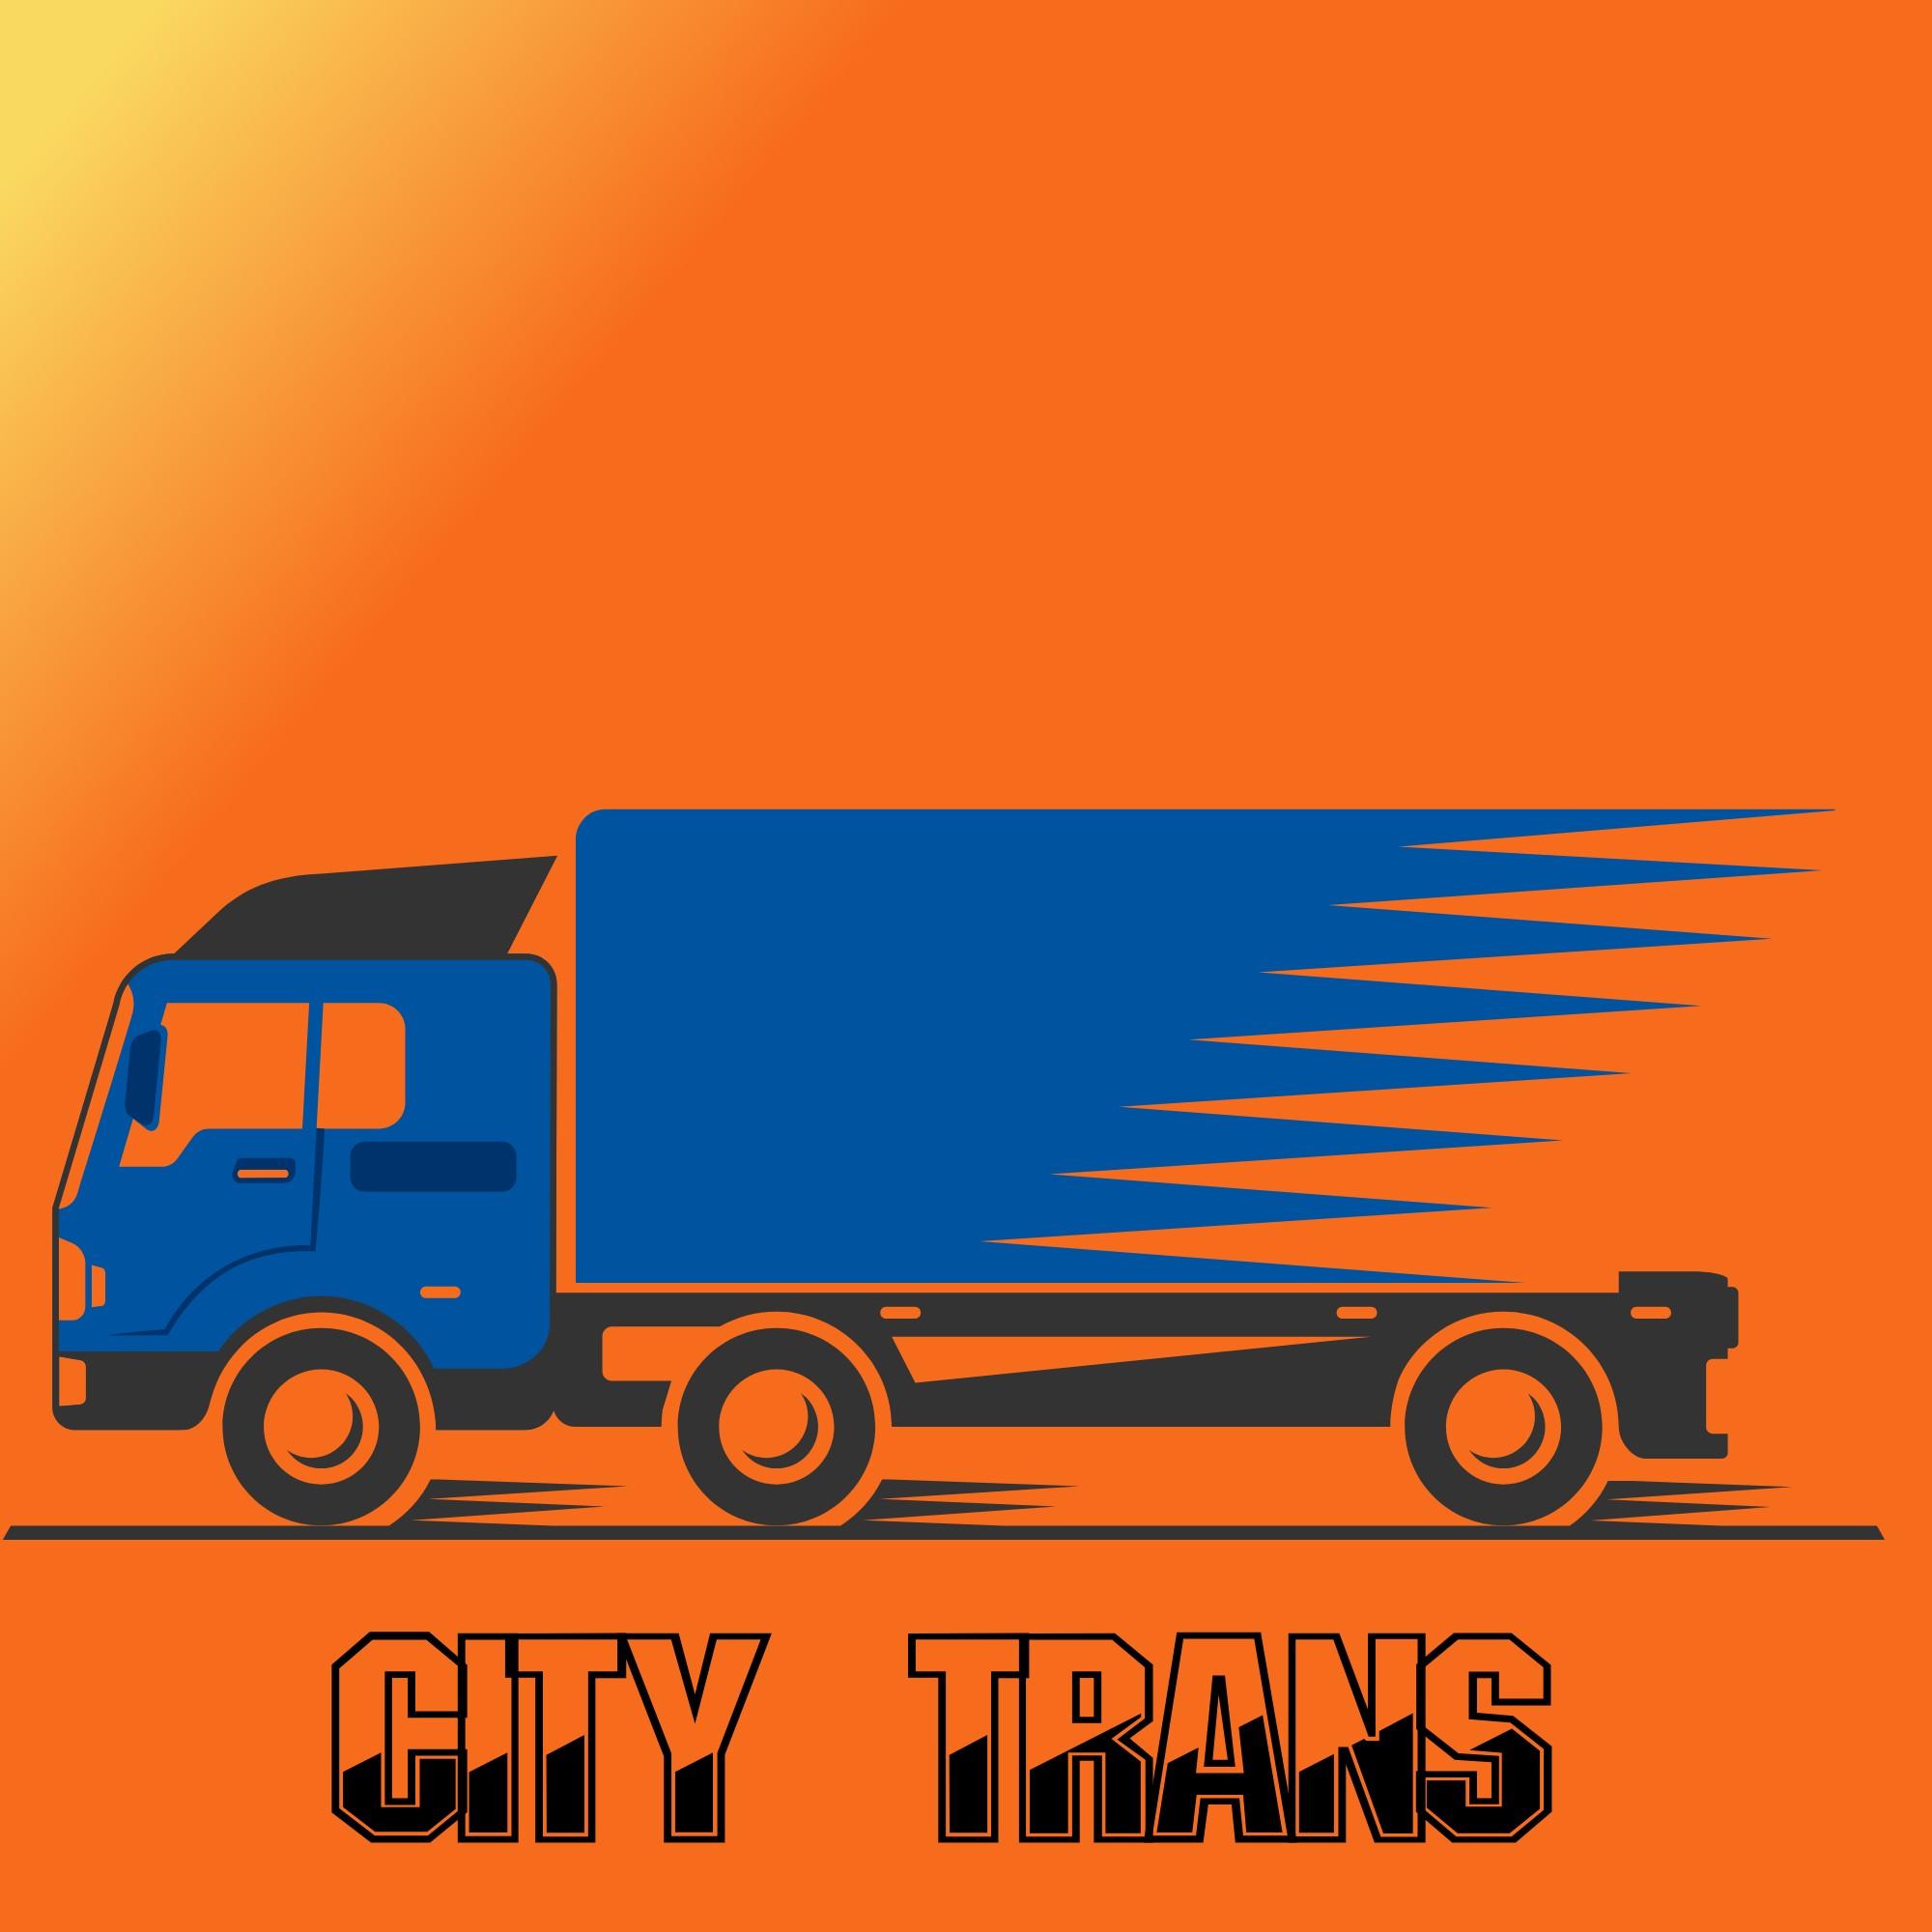 Разработка Логотипа транспортной компании фото f_3515e6ceb112b3ea.jpg